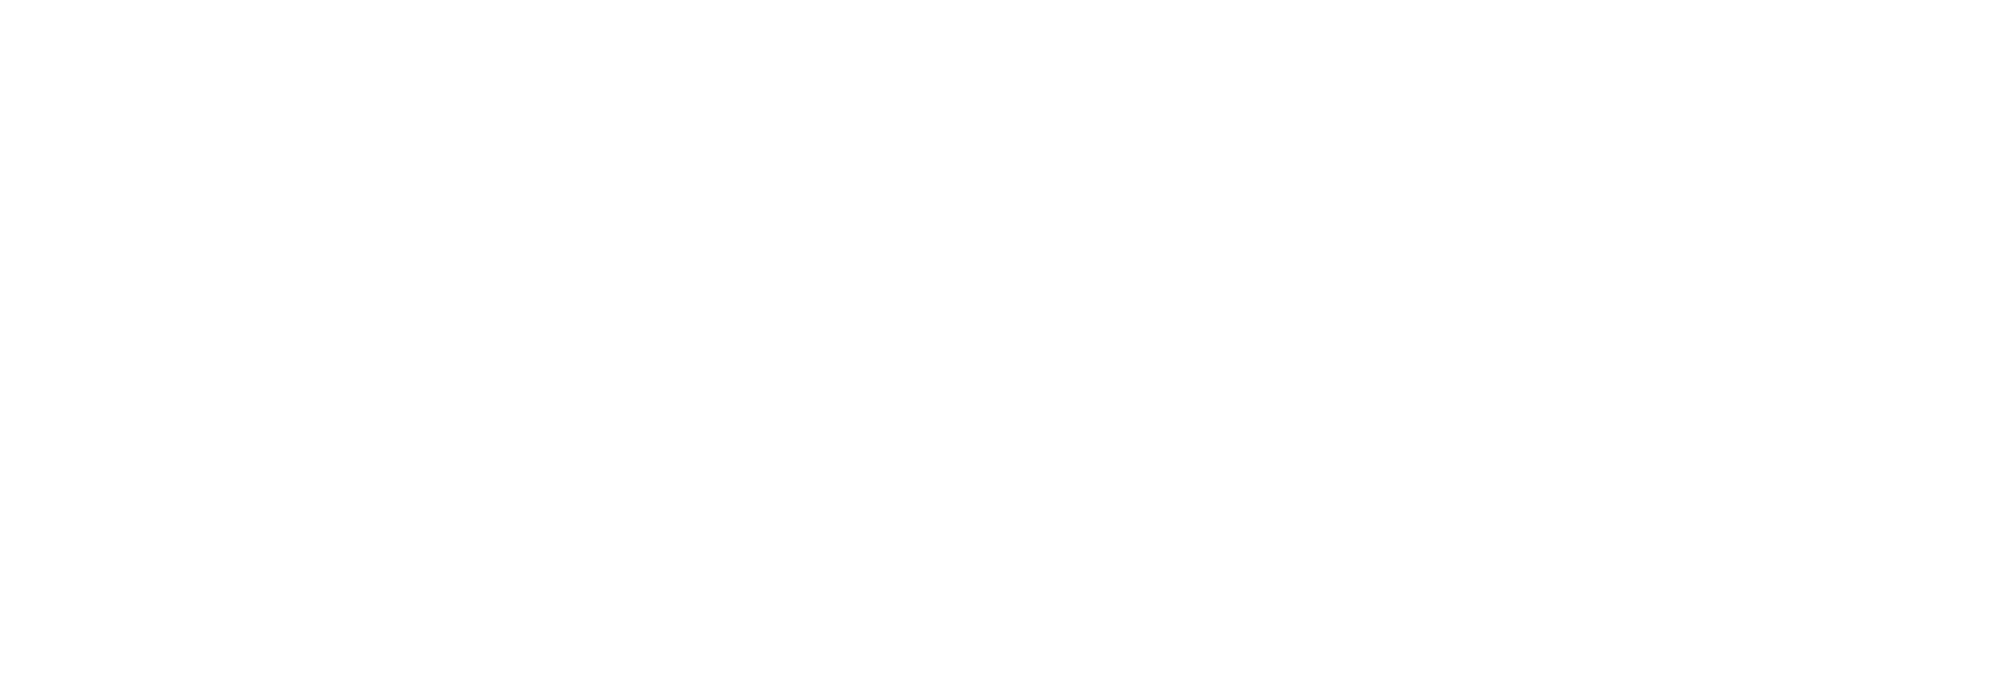 Fila Logos.